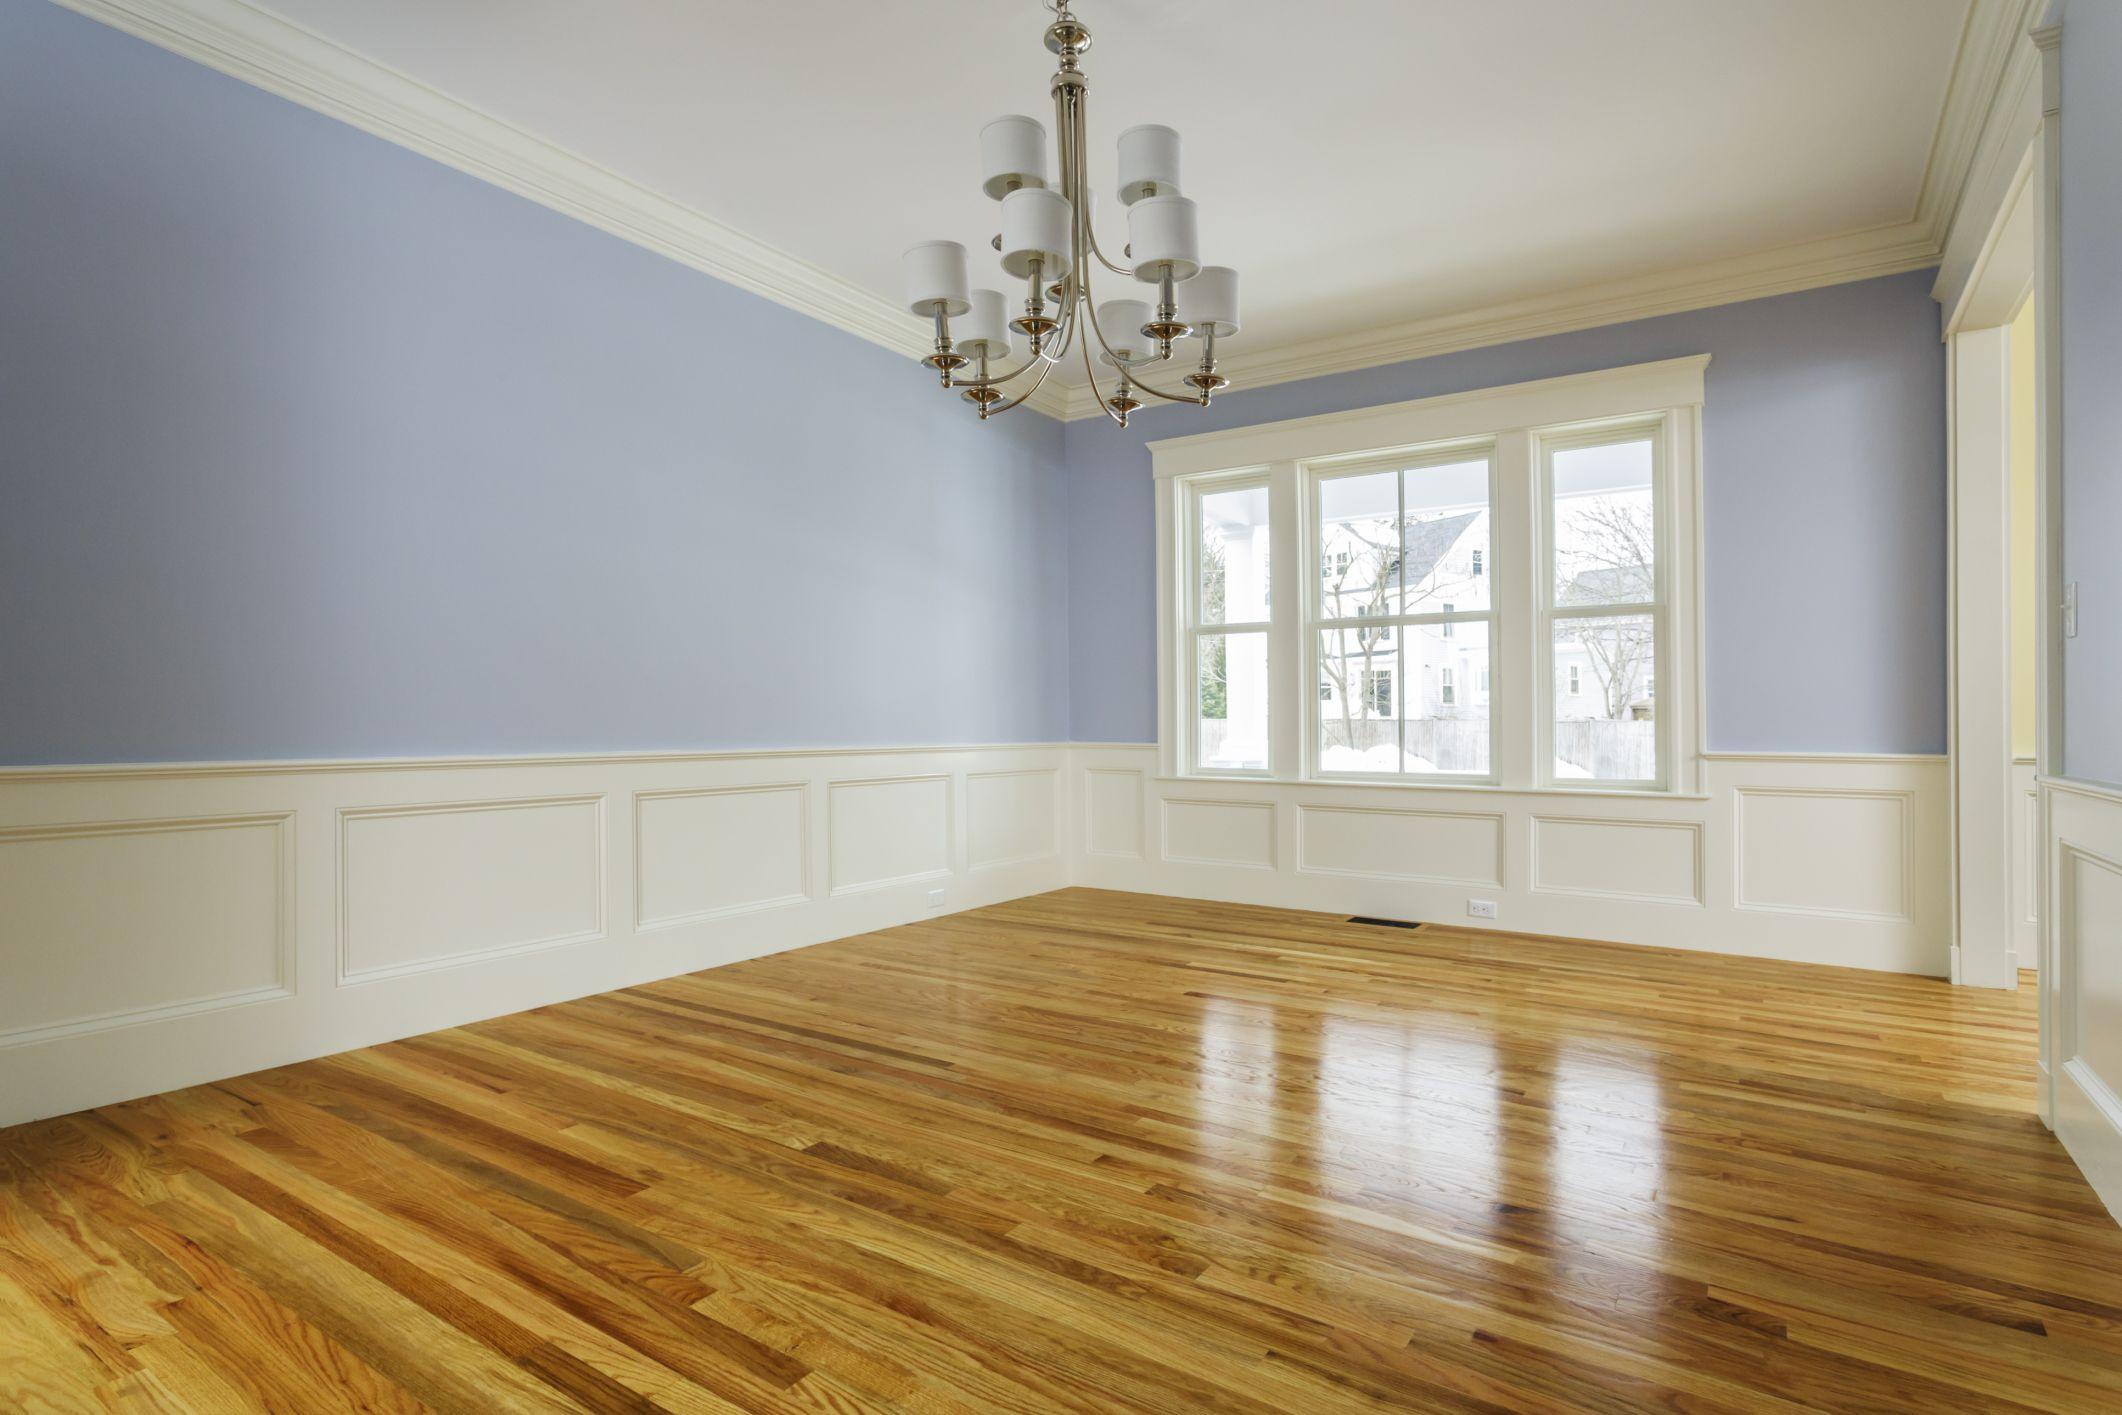 oak hardwood flooring canada of the cost to refinish hardwood floors with regard to 168686572 highres 56a2fd773df78cf7727b6cb3